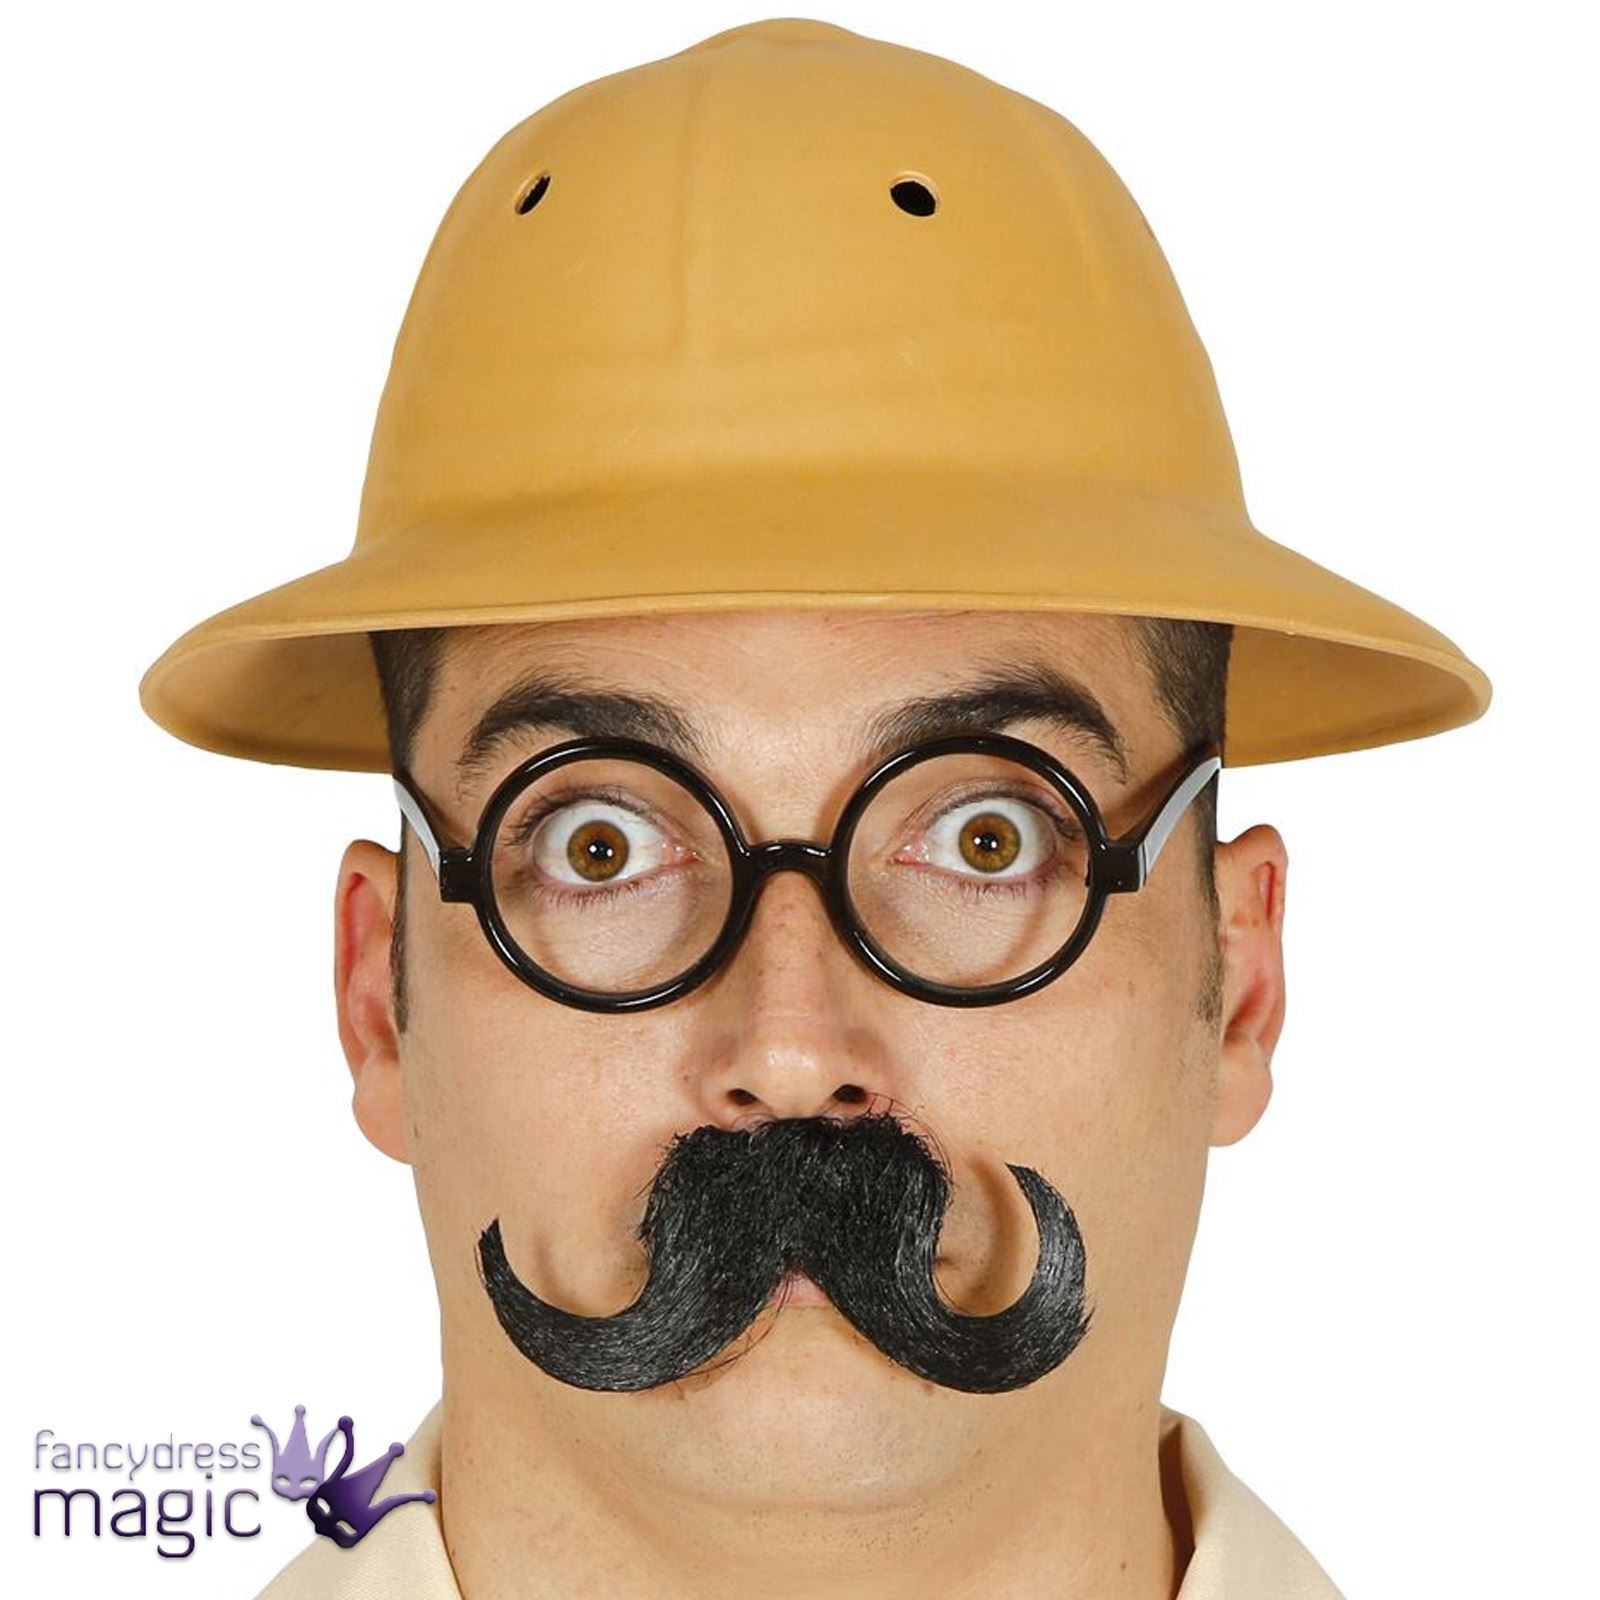 Adult Safari Explorer Zoo Keeper Jungle Fancy Dress Costume Accessory  Helmet Hat 89156906828